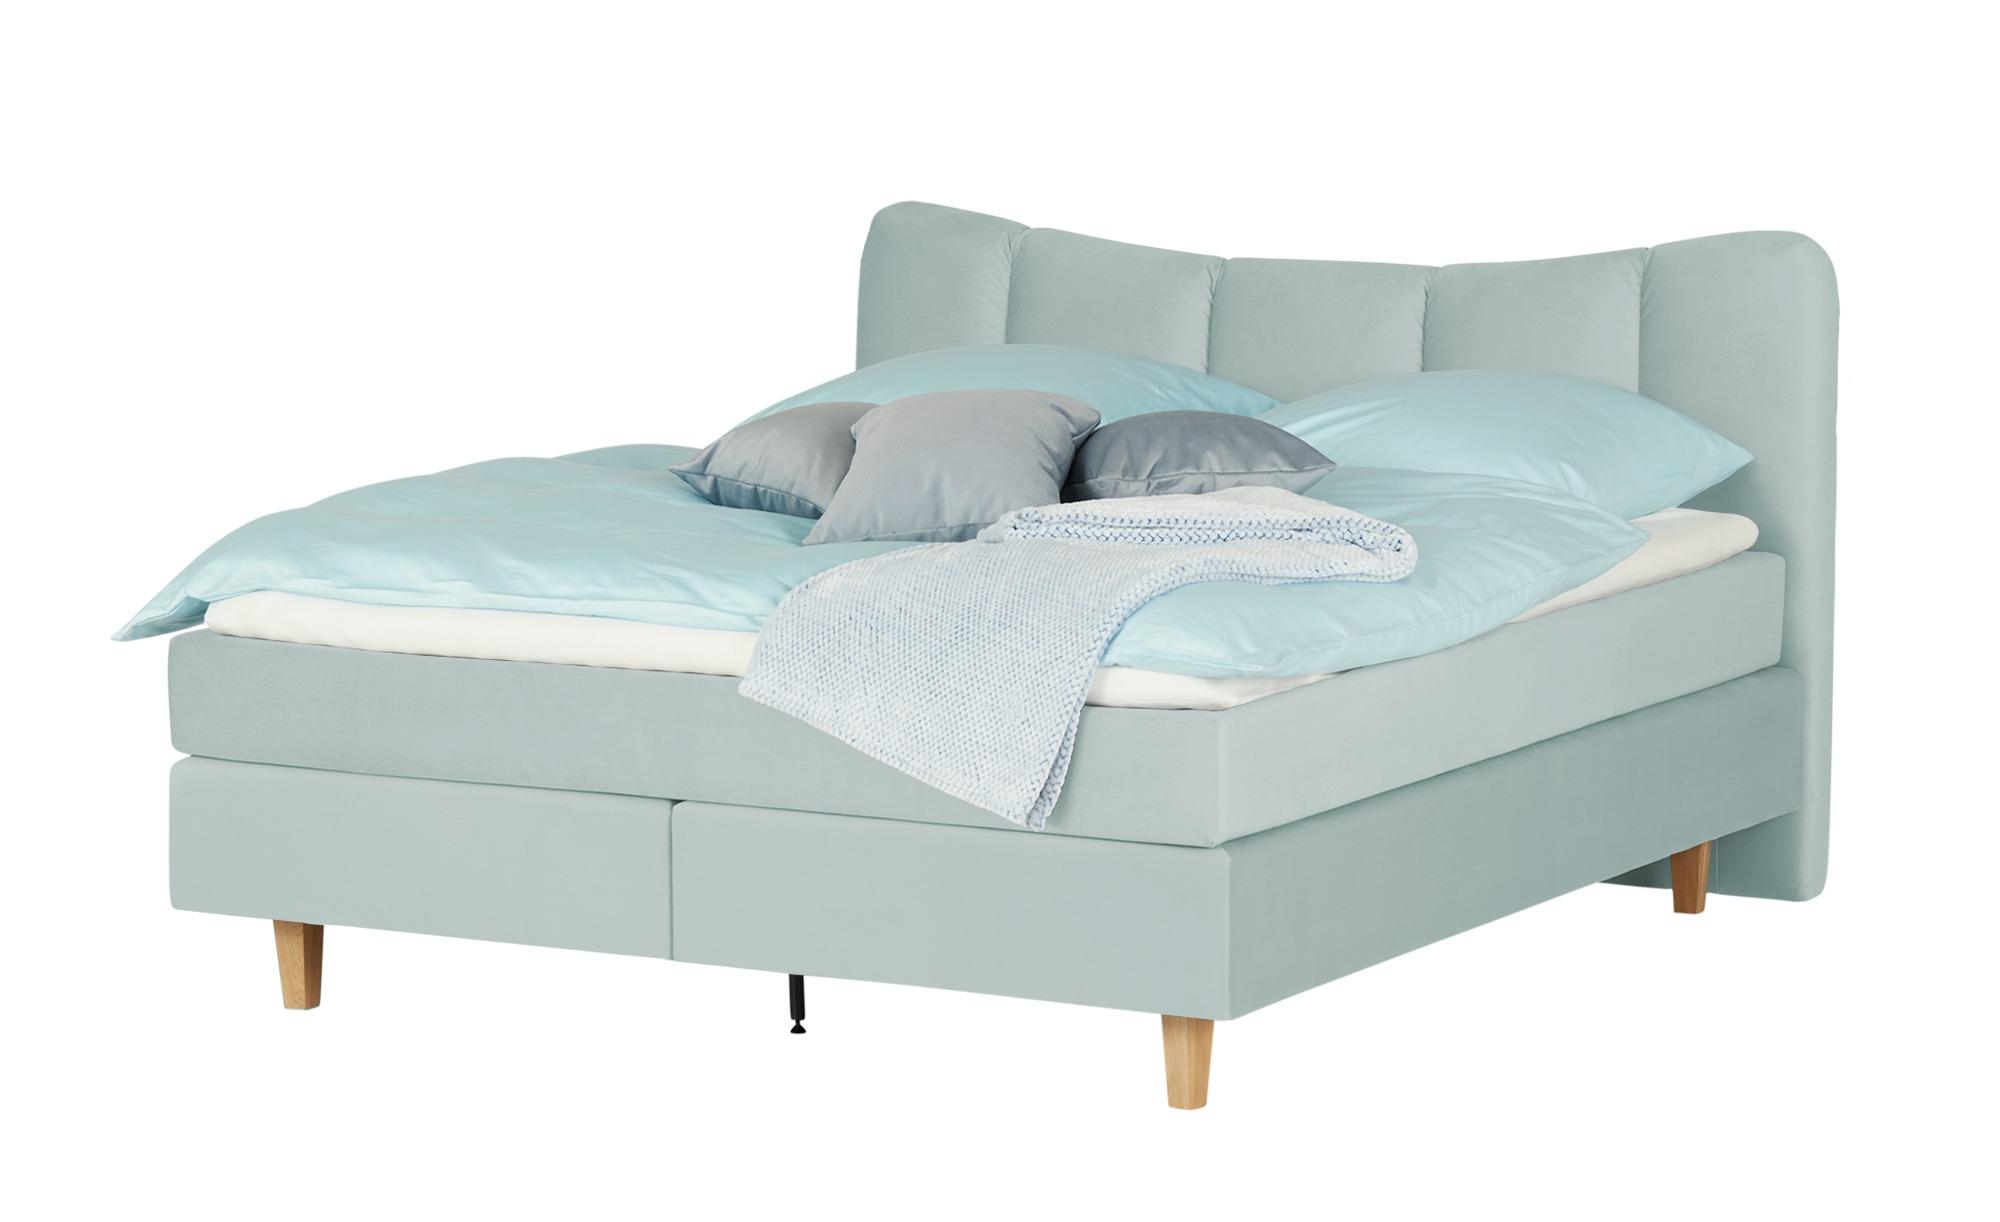 *Boxspringbett  Dalur 180 x 200 cm Eisblau – SKAGEN BEDS*